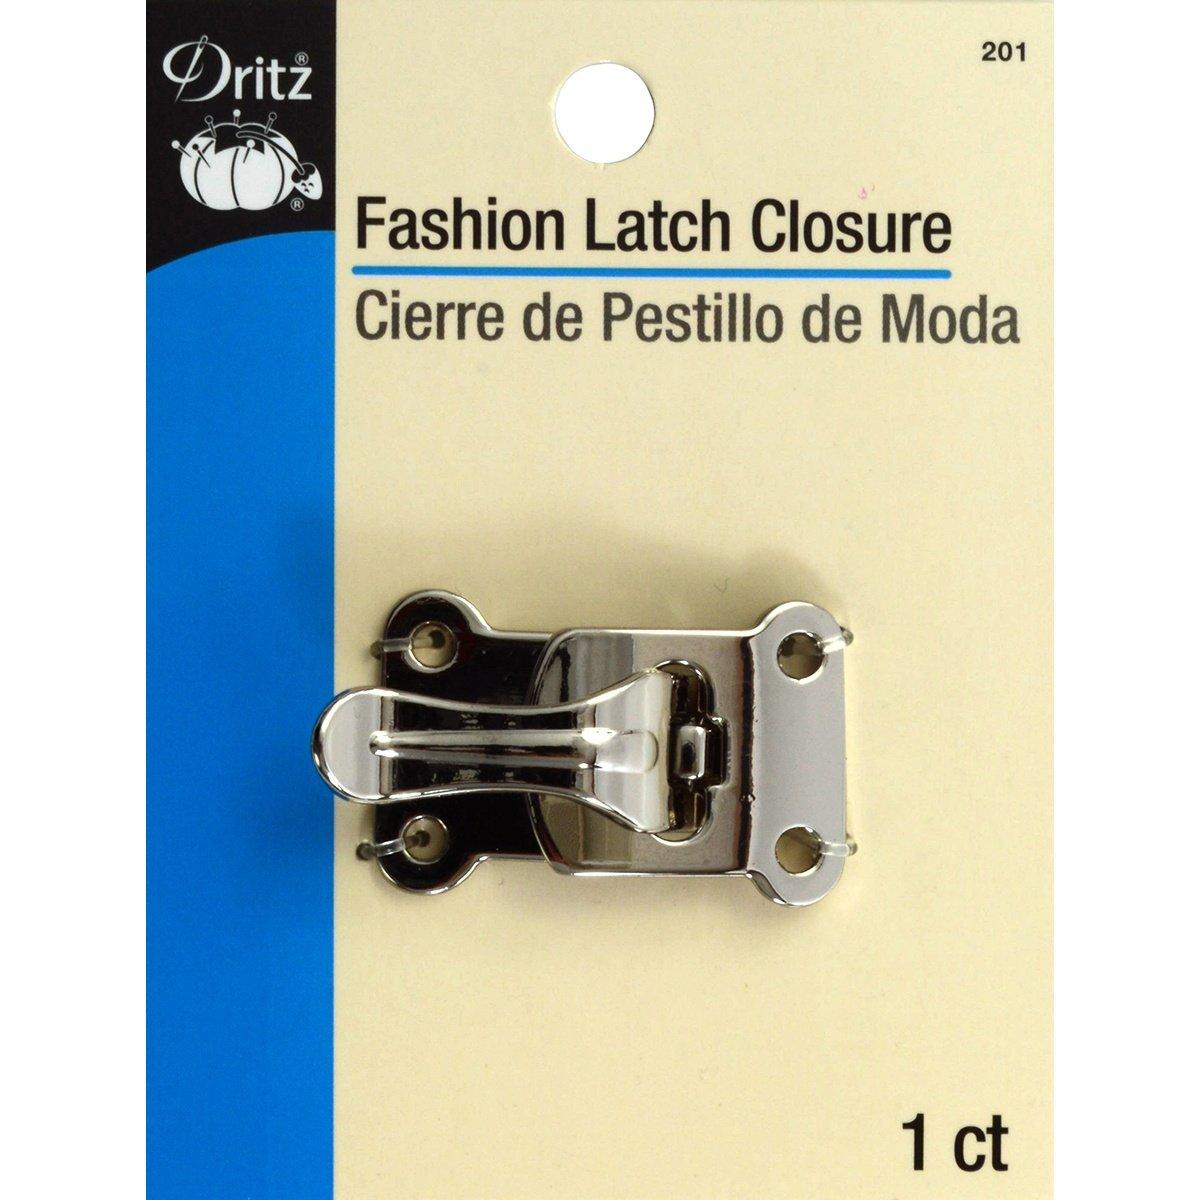 Dritz Fashion Latch Closure 201